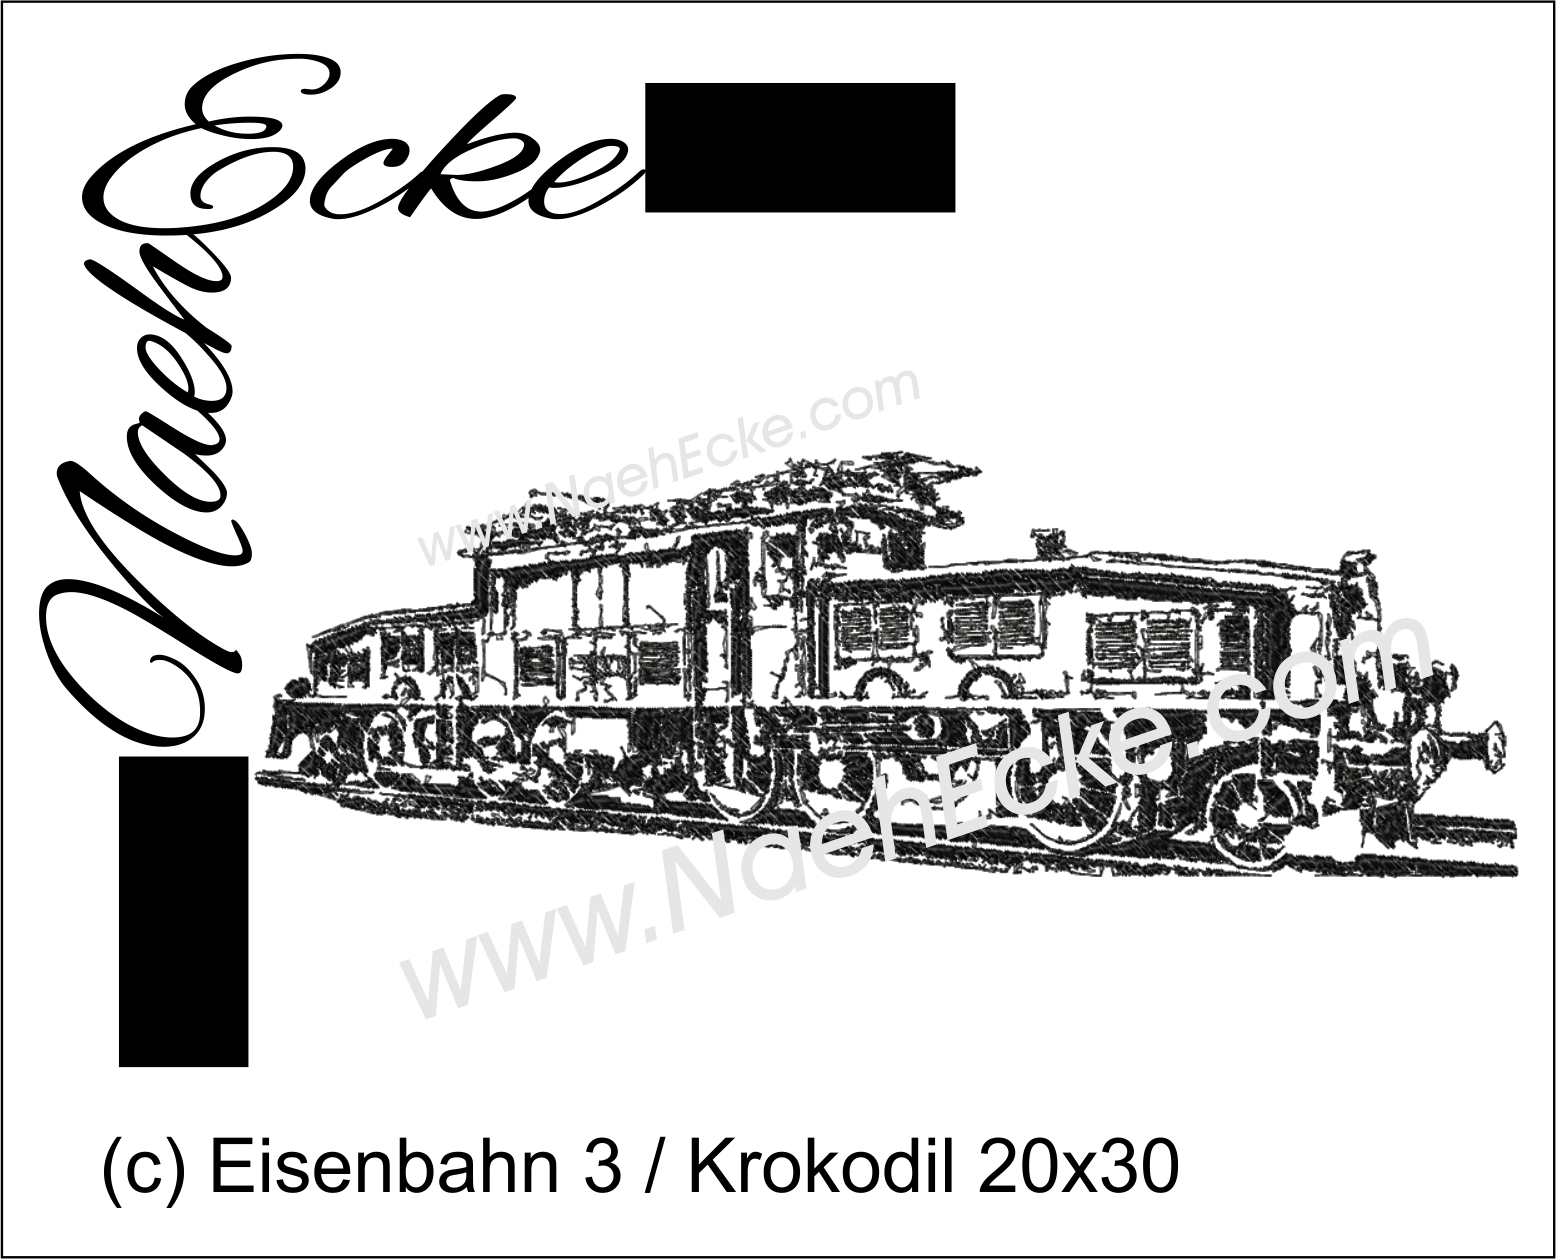 Eisenbahn 3 / Krokodil